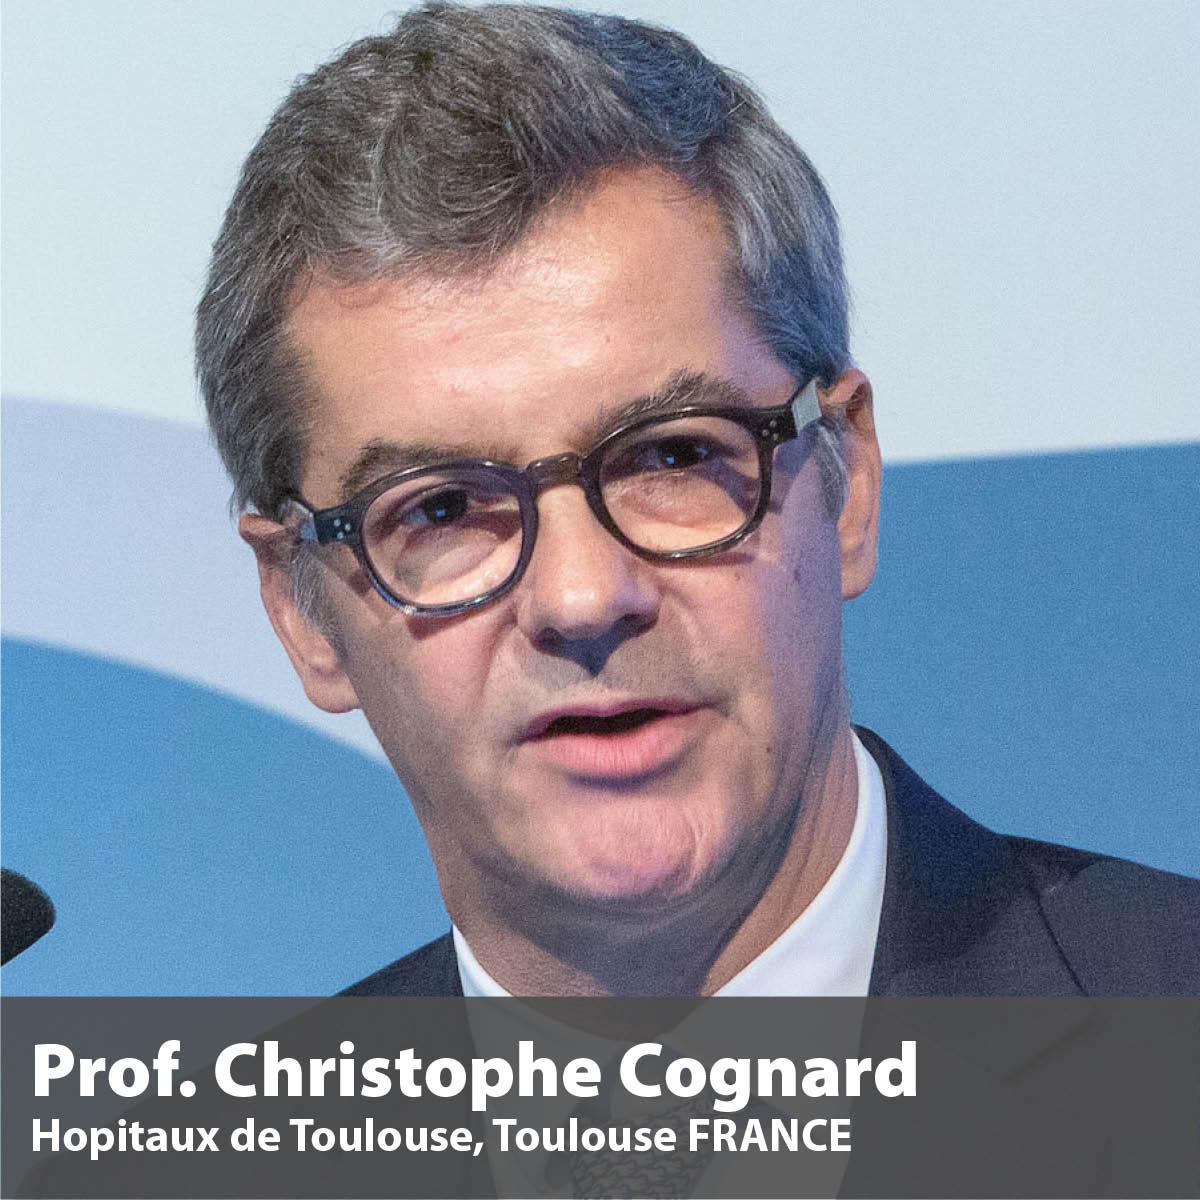 Mentor Prof. Christophe Cognard